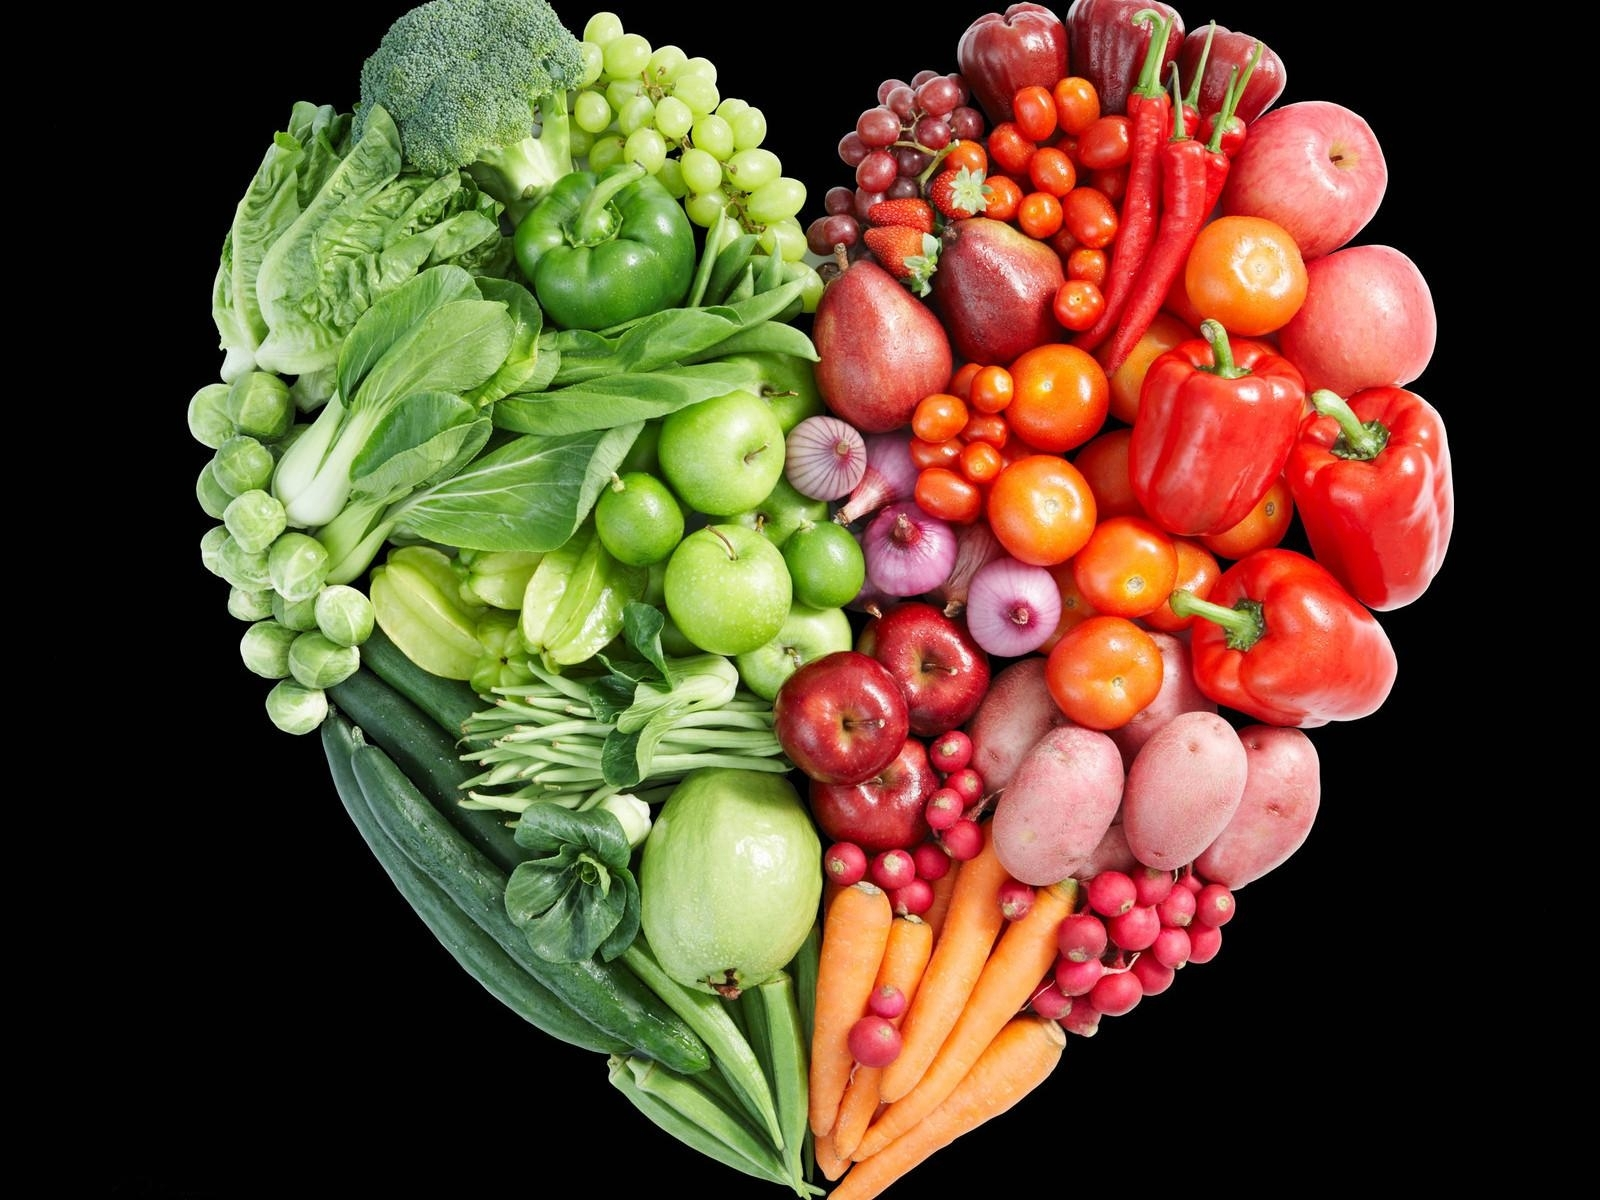 Food   Fruits Vegetables Vegetable Wallpaper 1600x1200